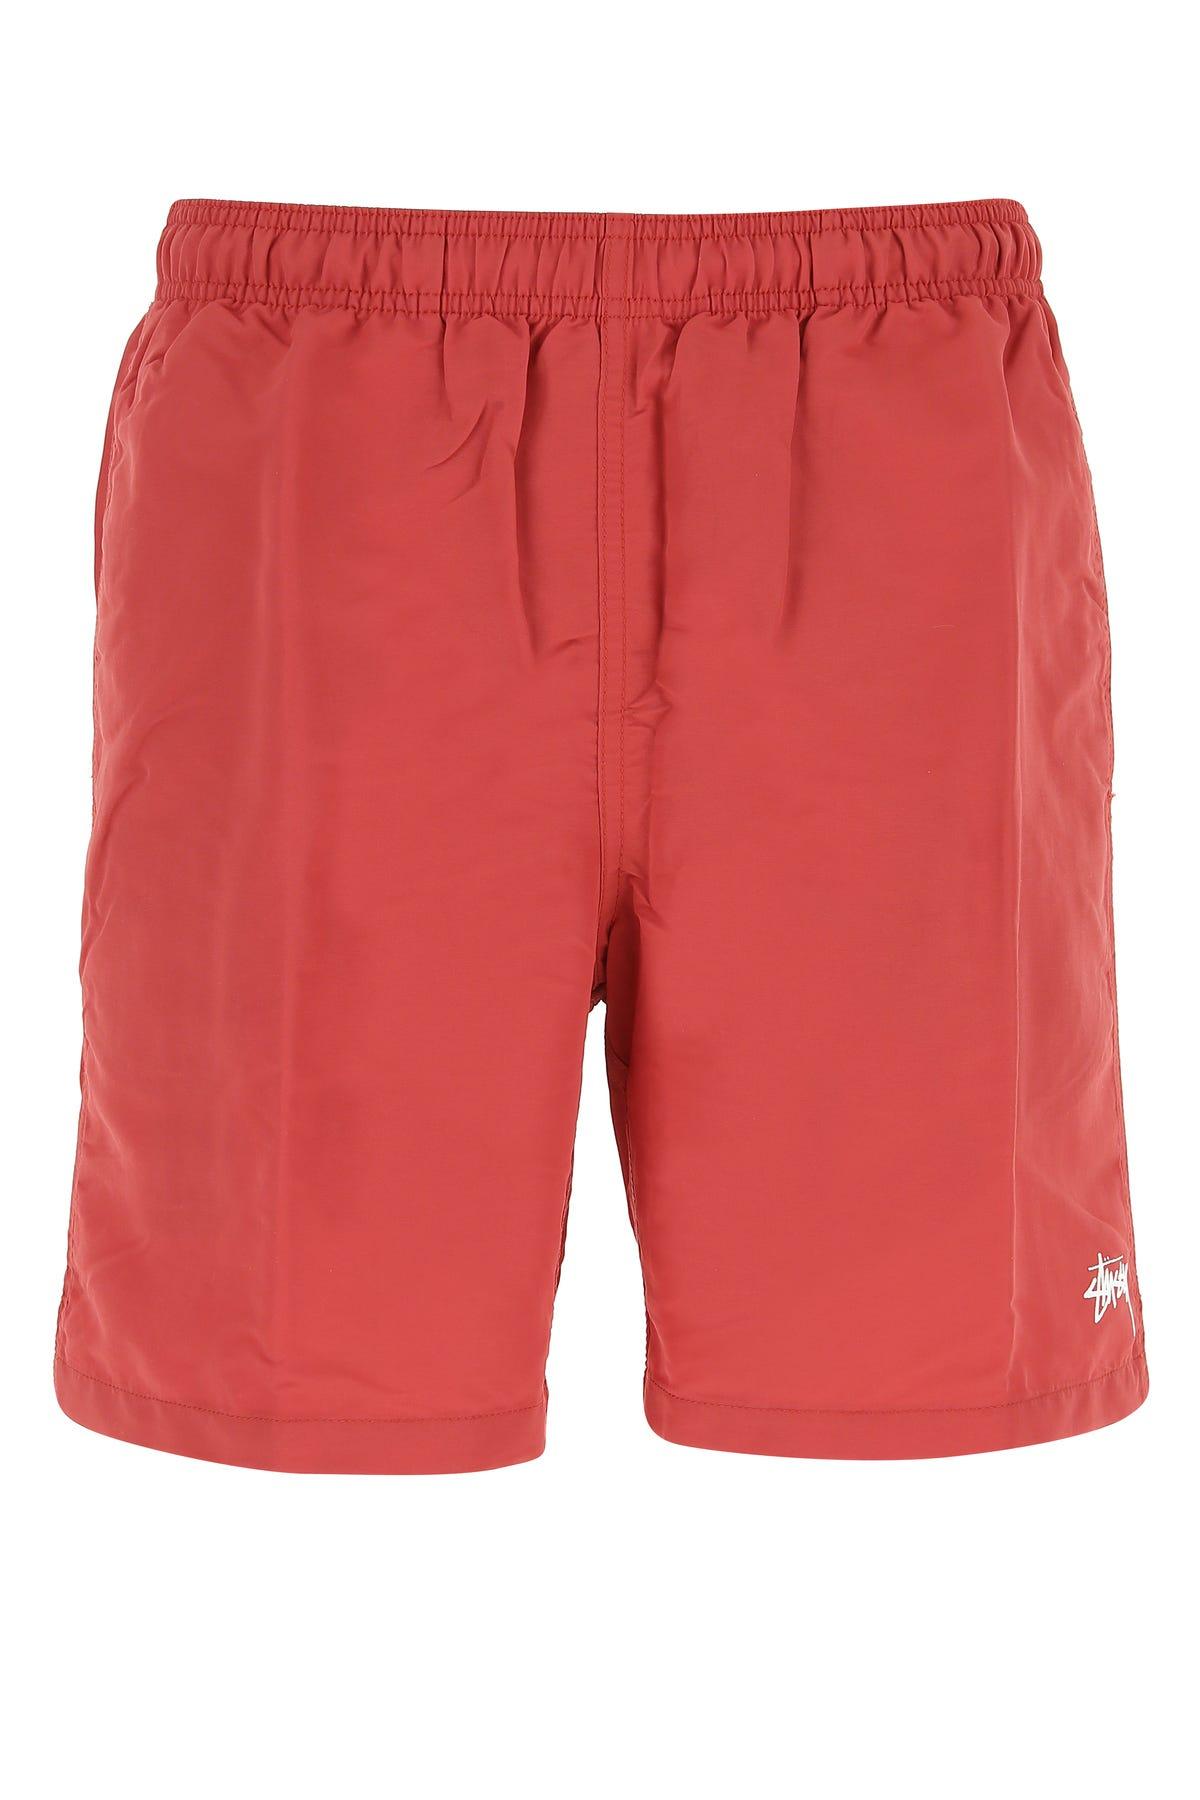 Stussy Red Nylon Swimming Shorts  Nd  Uomo M